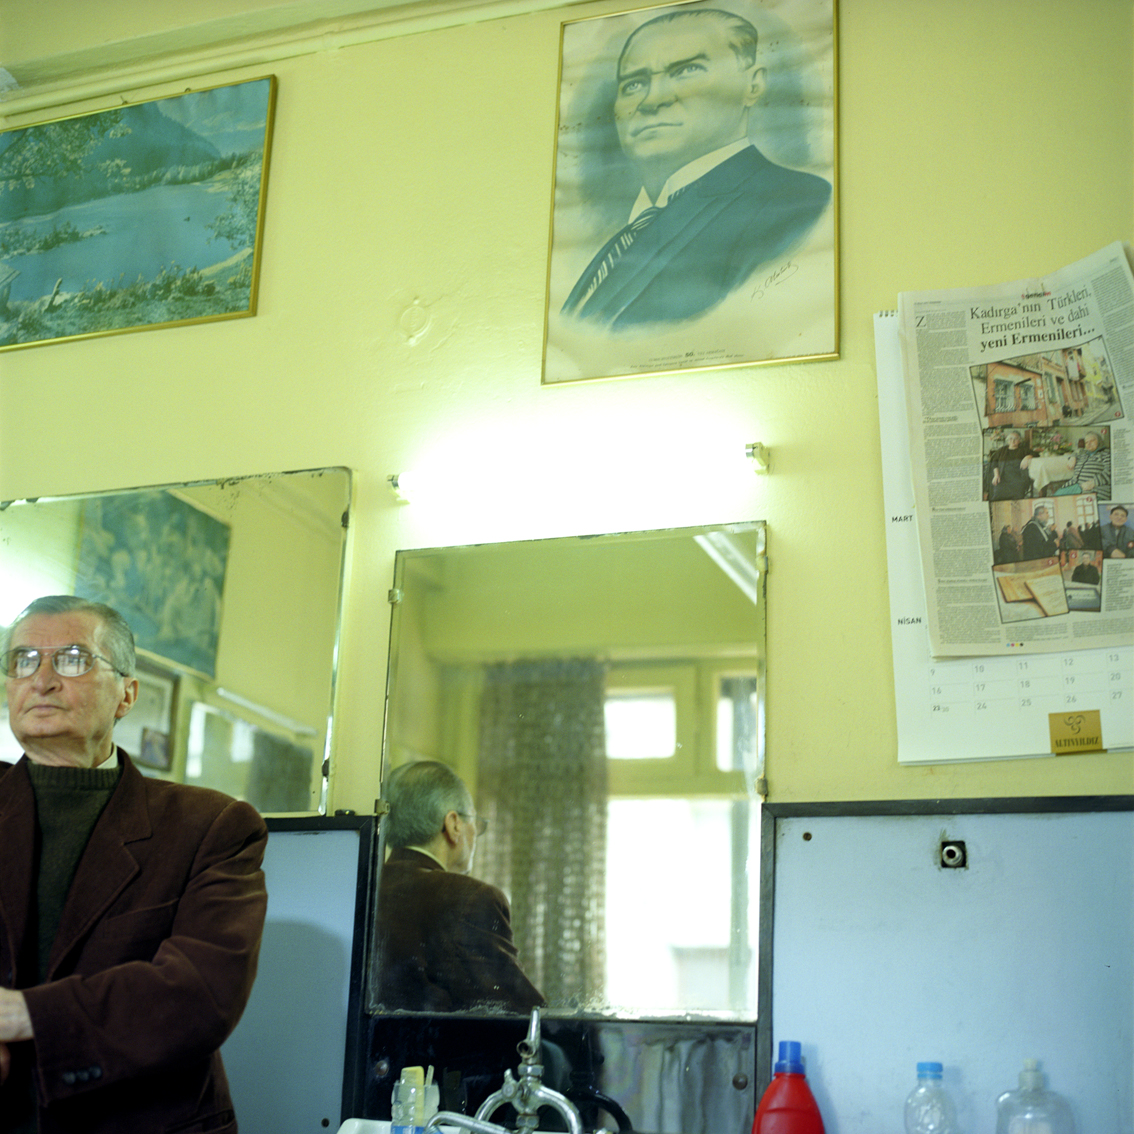 Barber shop in Istanbul, Turkey